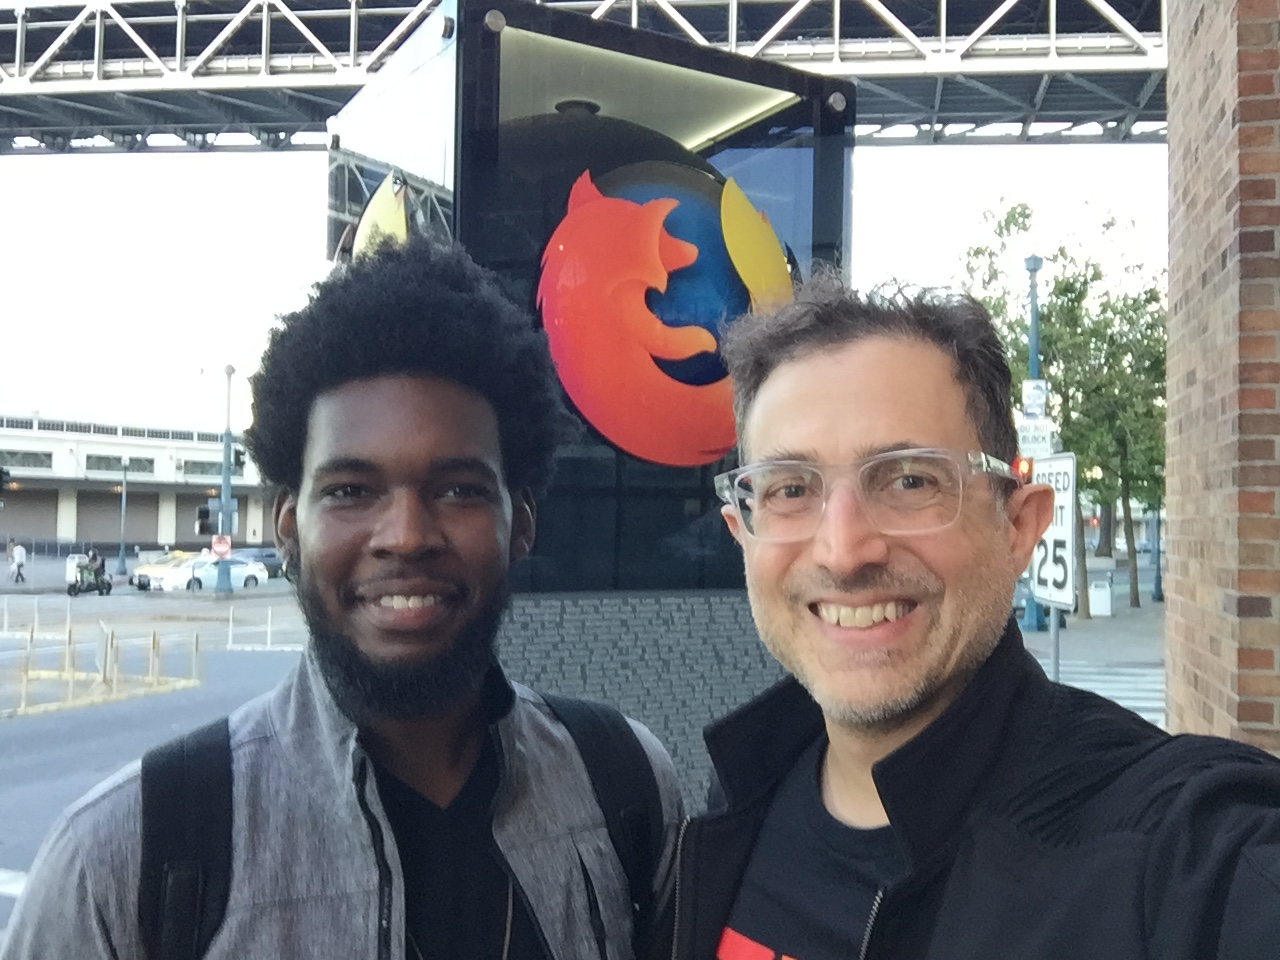 Jacky Alcine and Tantek Çelik outside Mozilla San Francisco right after doing Homebrew Website Club San Francisco inside